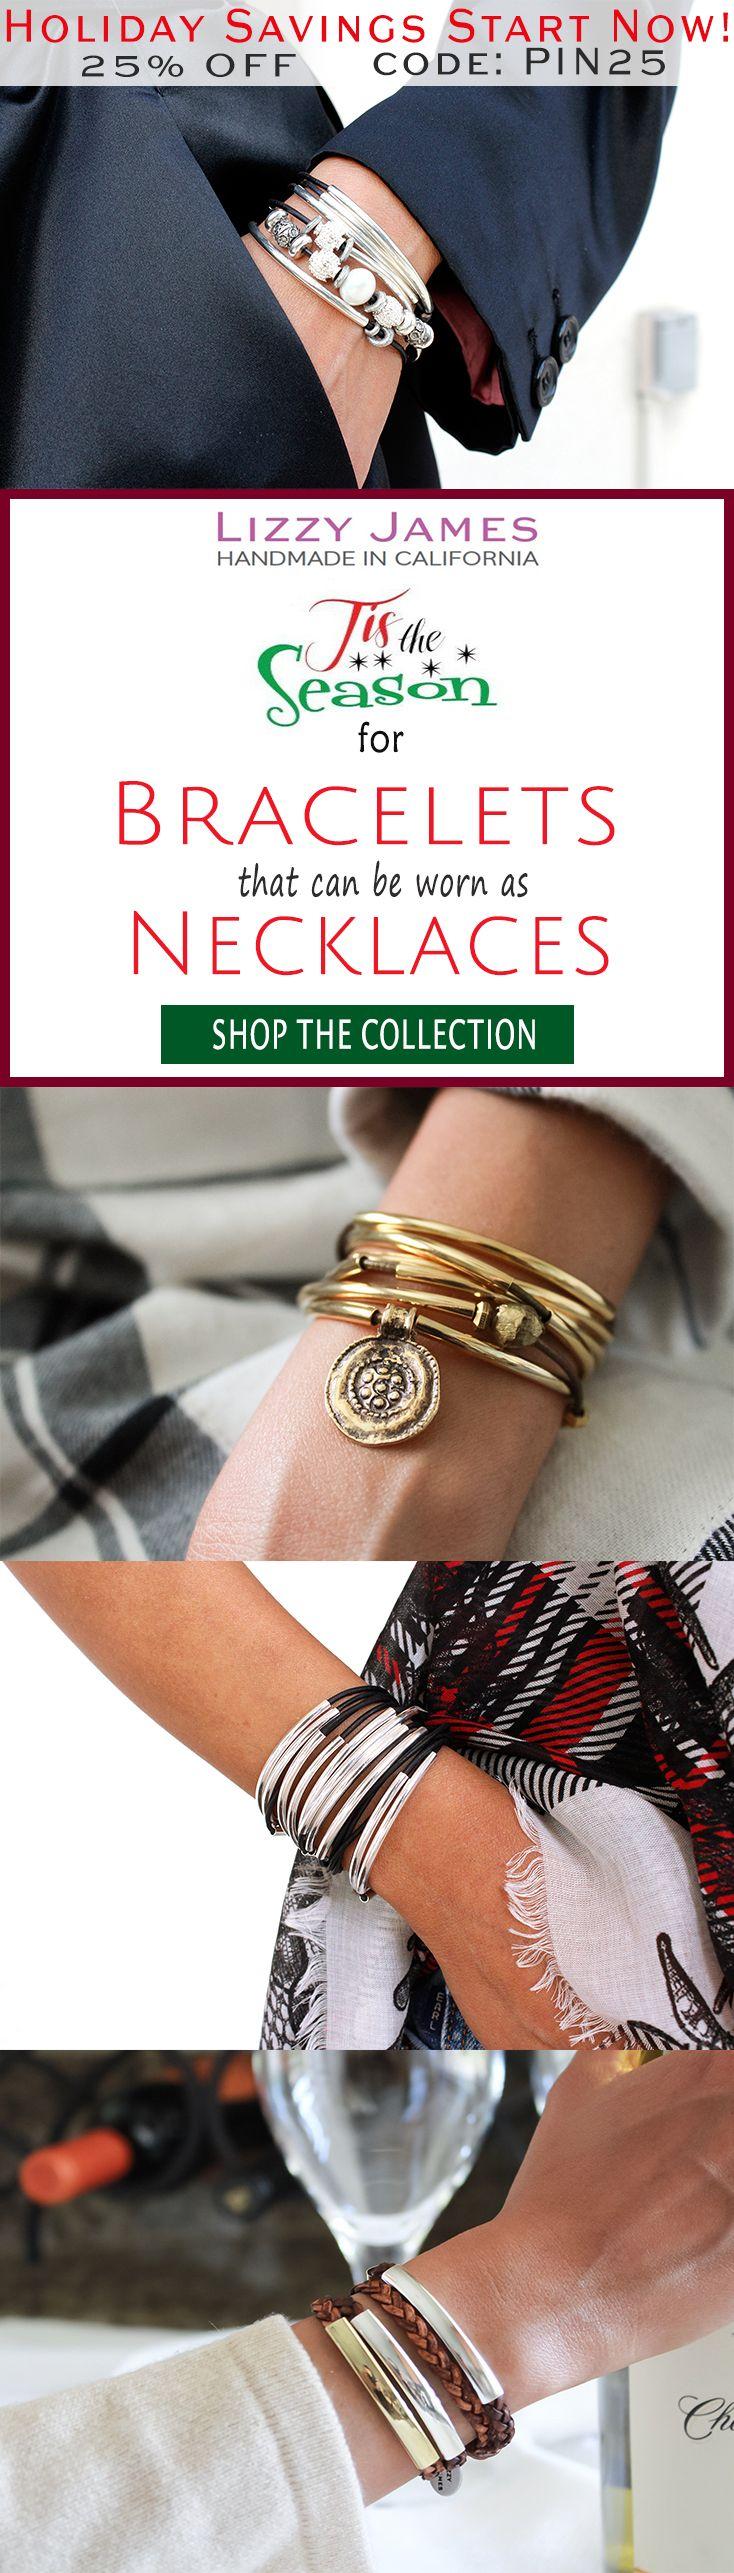 kia bhldn pinterest from finishing touches pin bracelets fashion bracelet